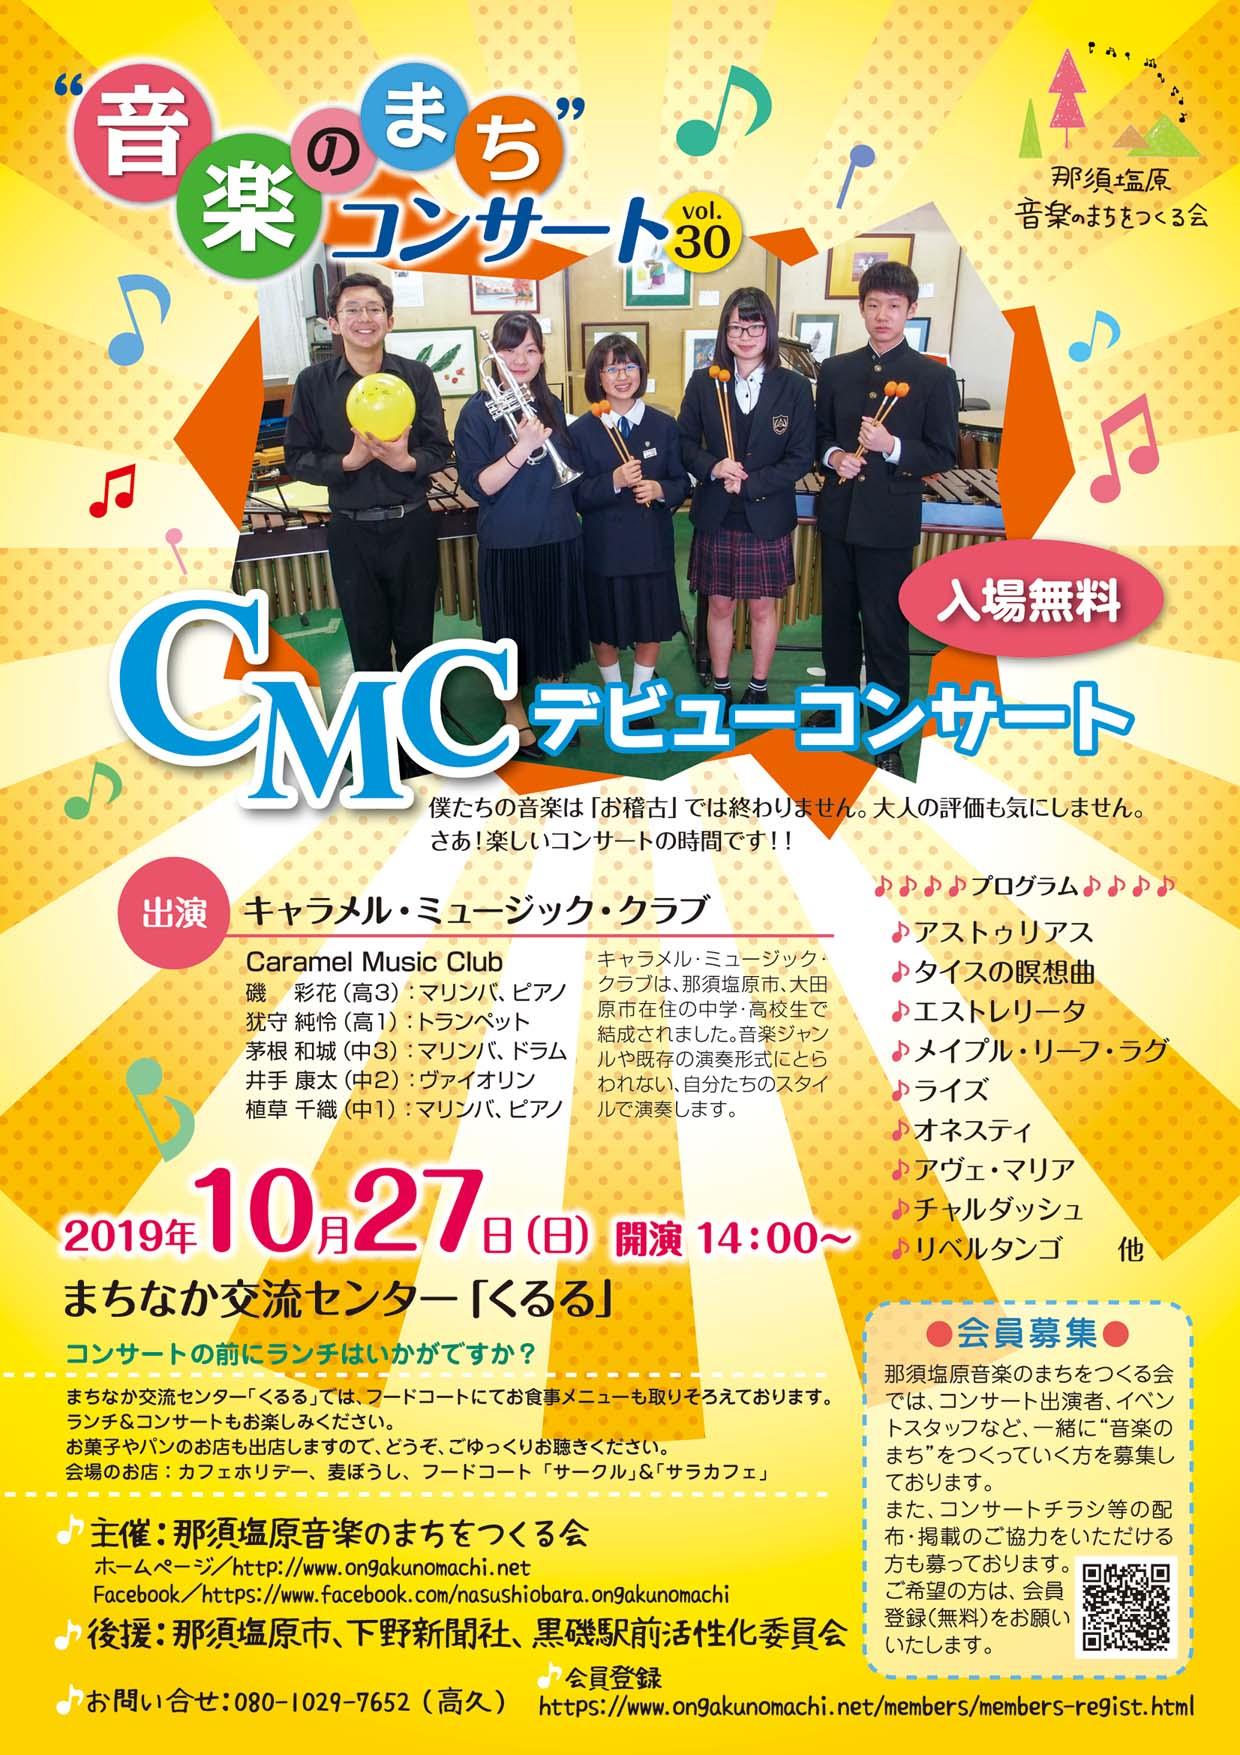 CMC デビューコンサート